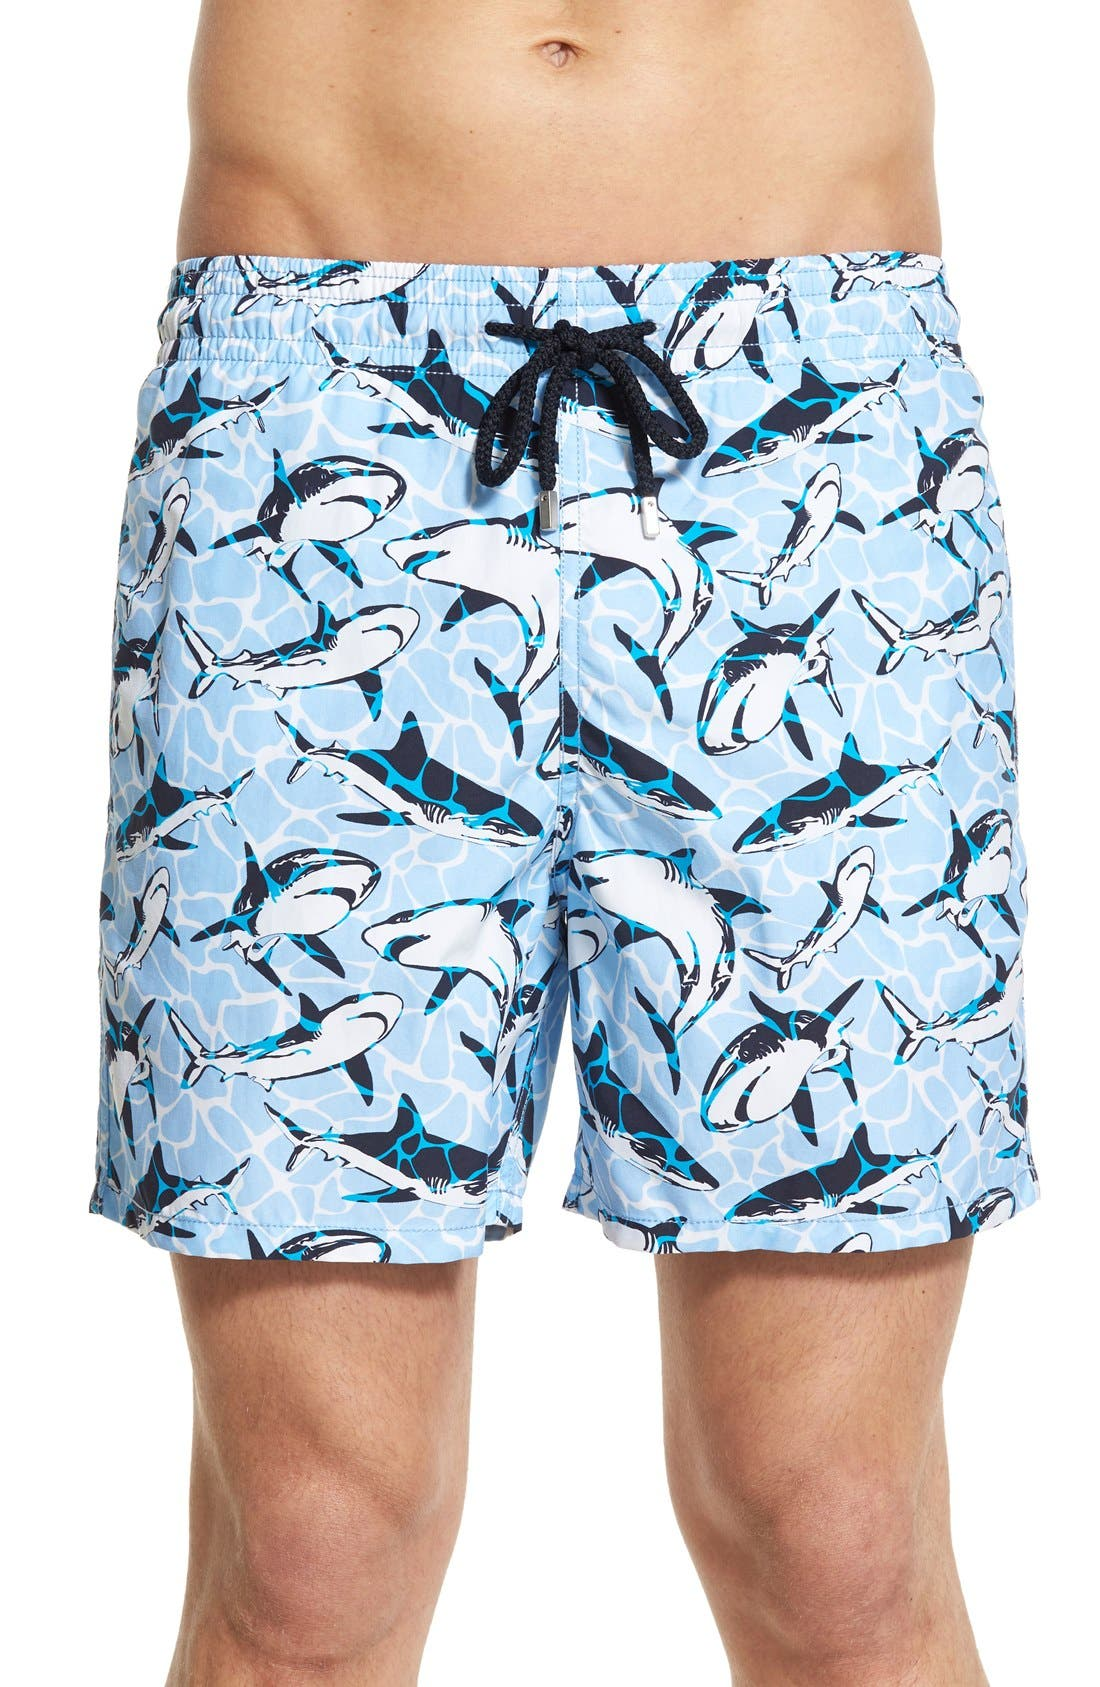 'Moorea - Sharks' Swim Trunks,                             Main thumbnail 1, color,                             Sky Blue